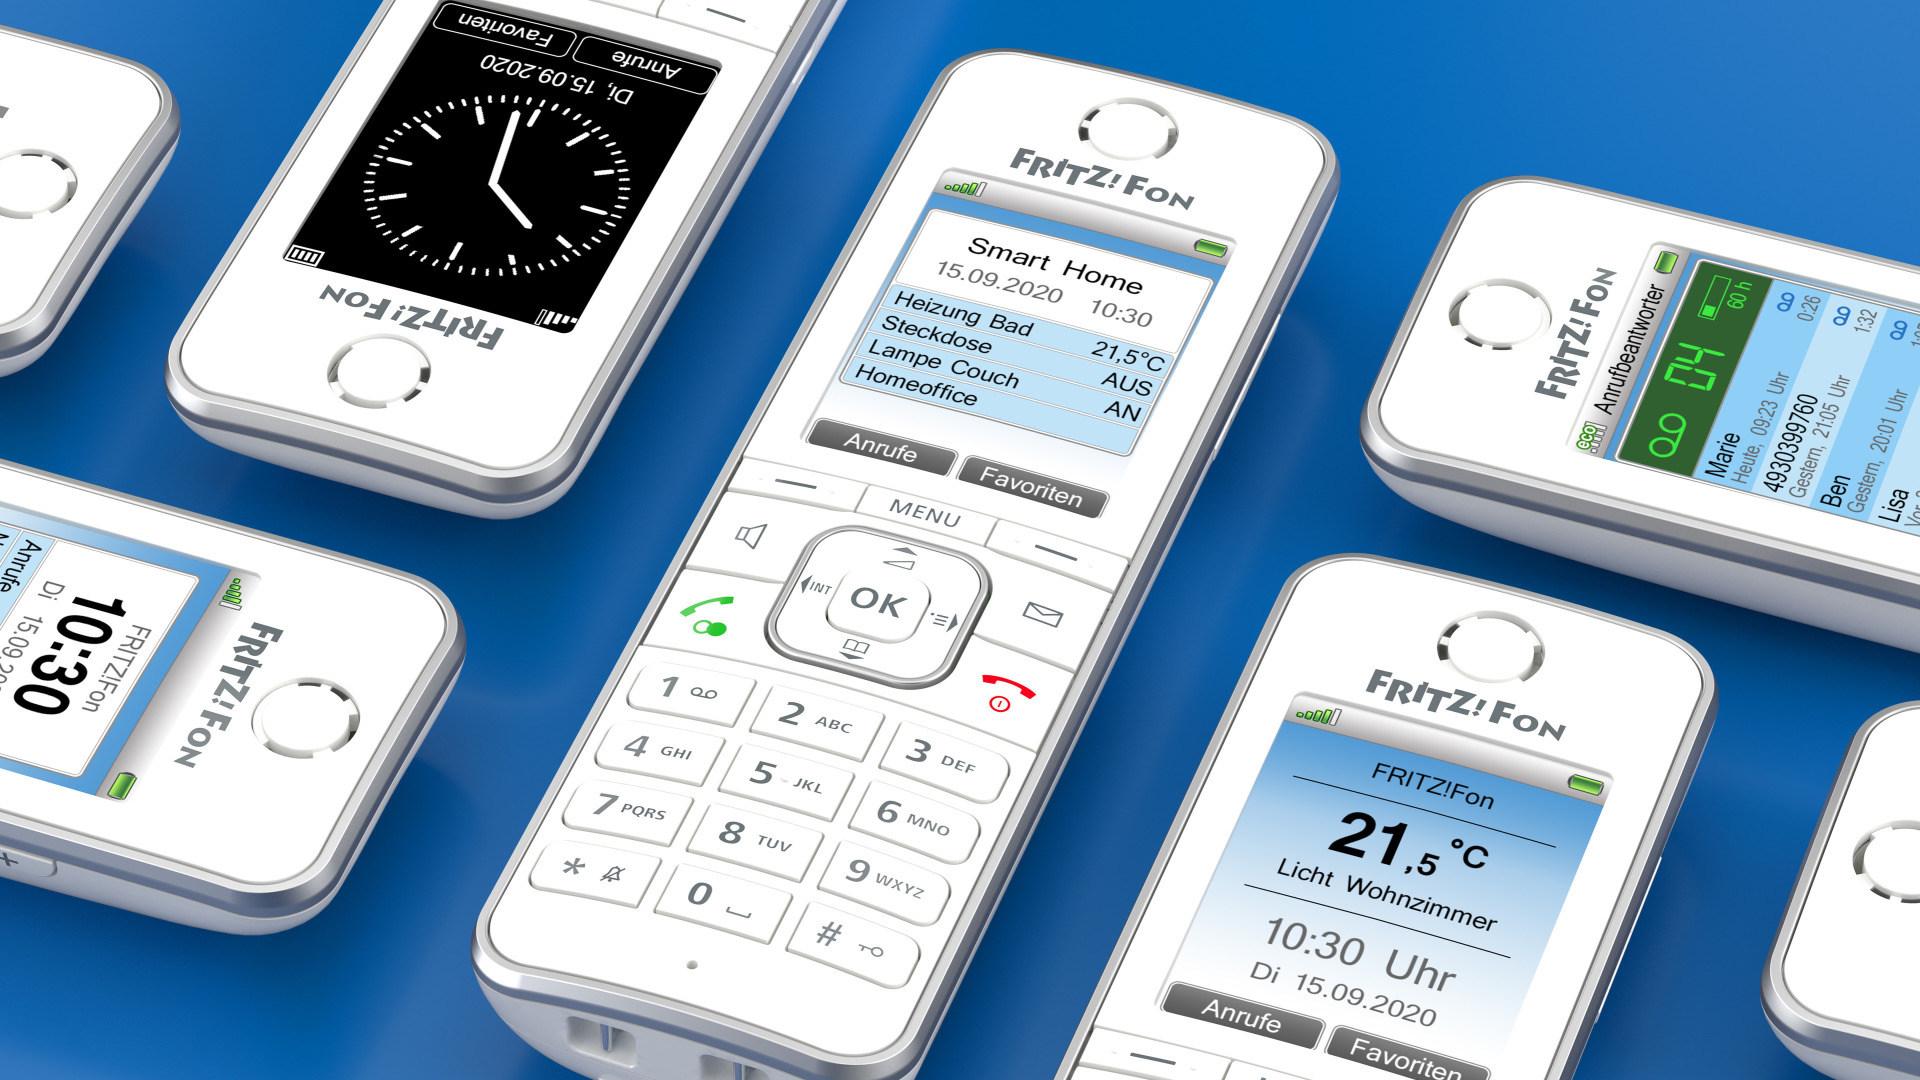 Avm, FritzOS, Telefon, FritzFon, Dect, C6, DECT-Fon